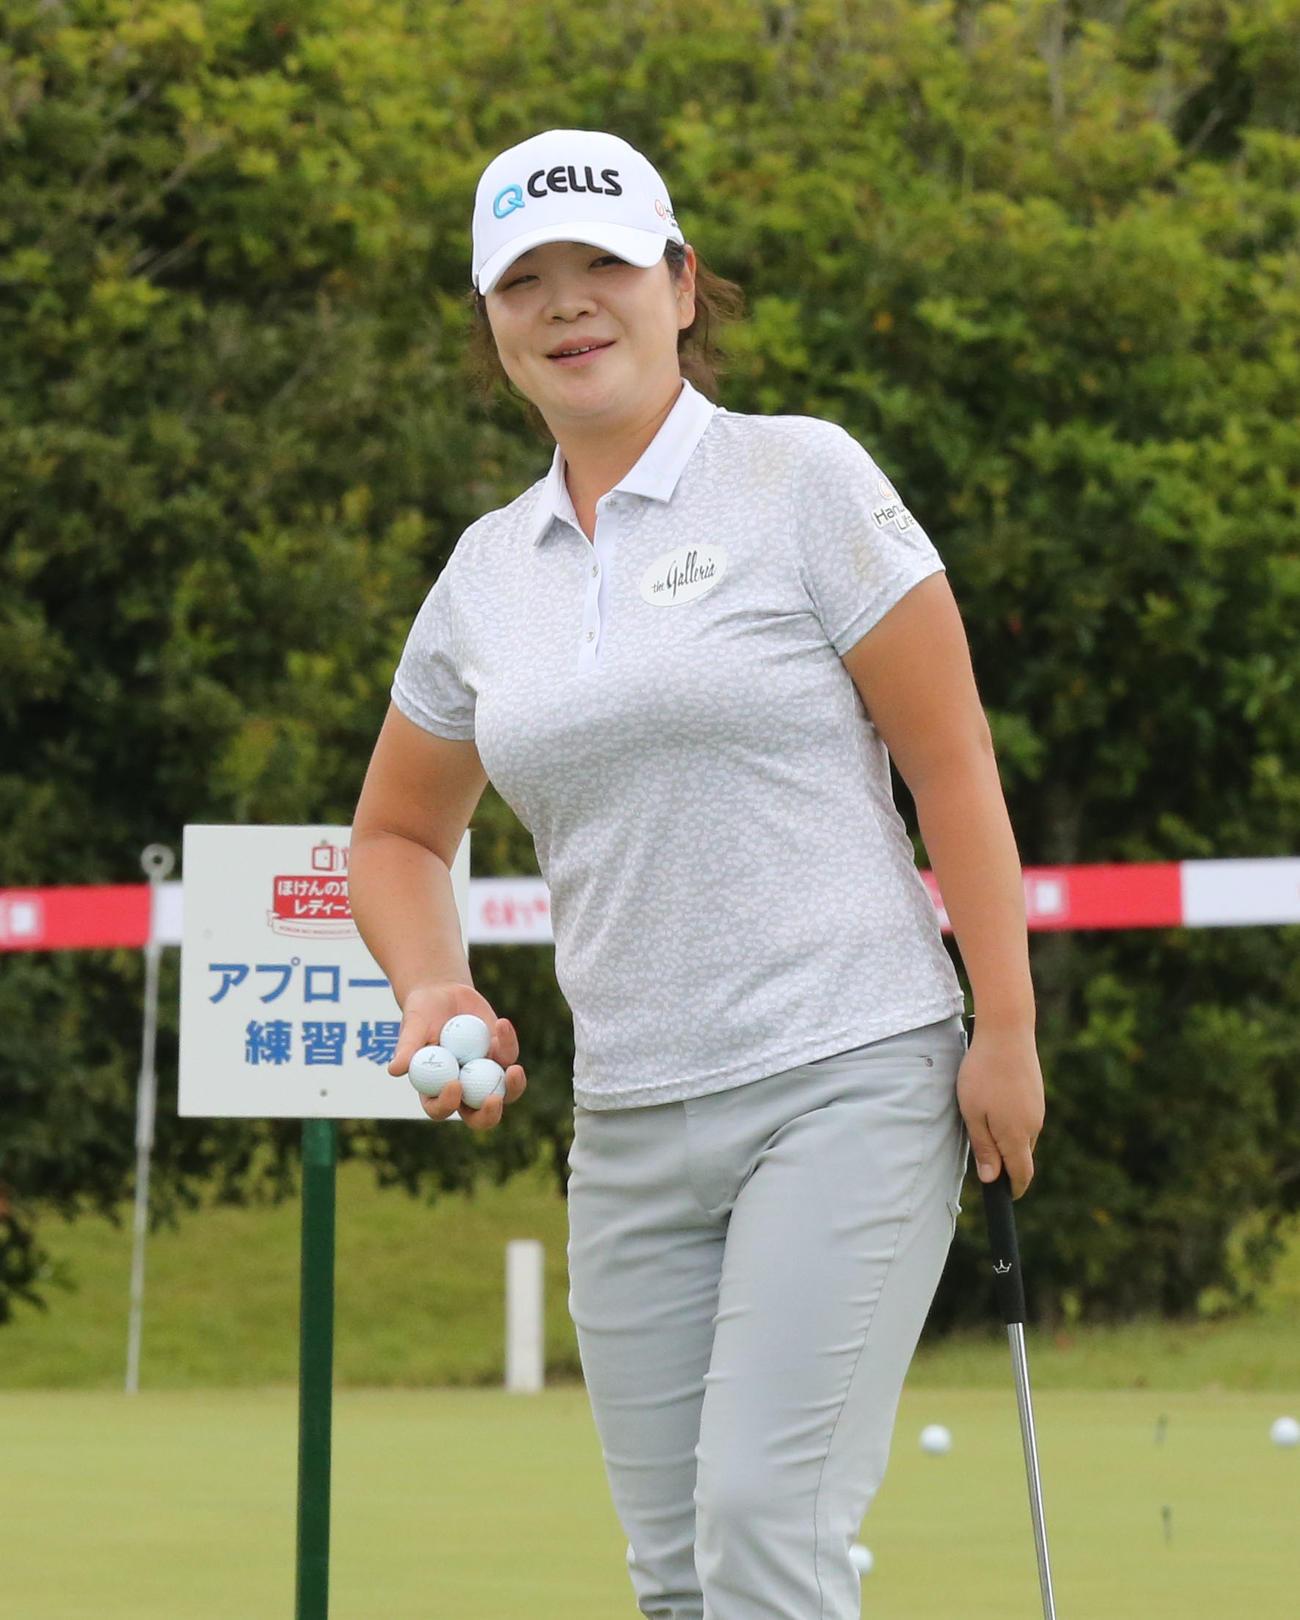 https://www.nikkansports.com/sports/golf/news/img/202105130000528-w1300_15.jpg